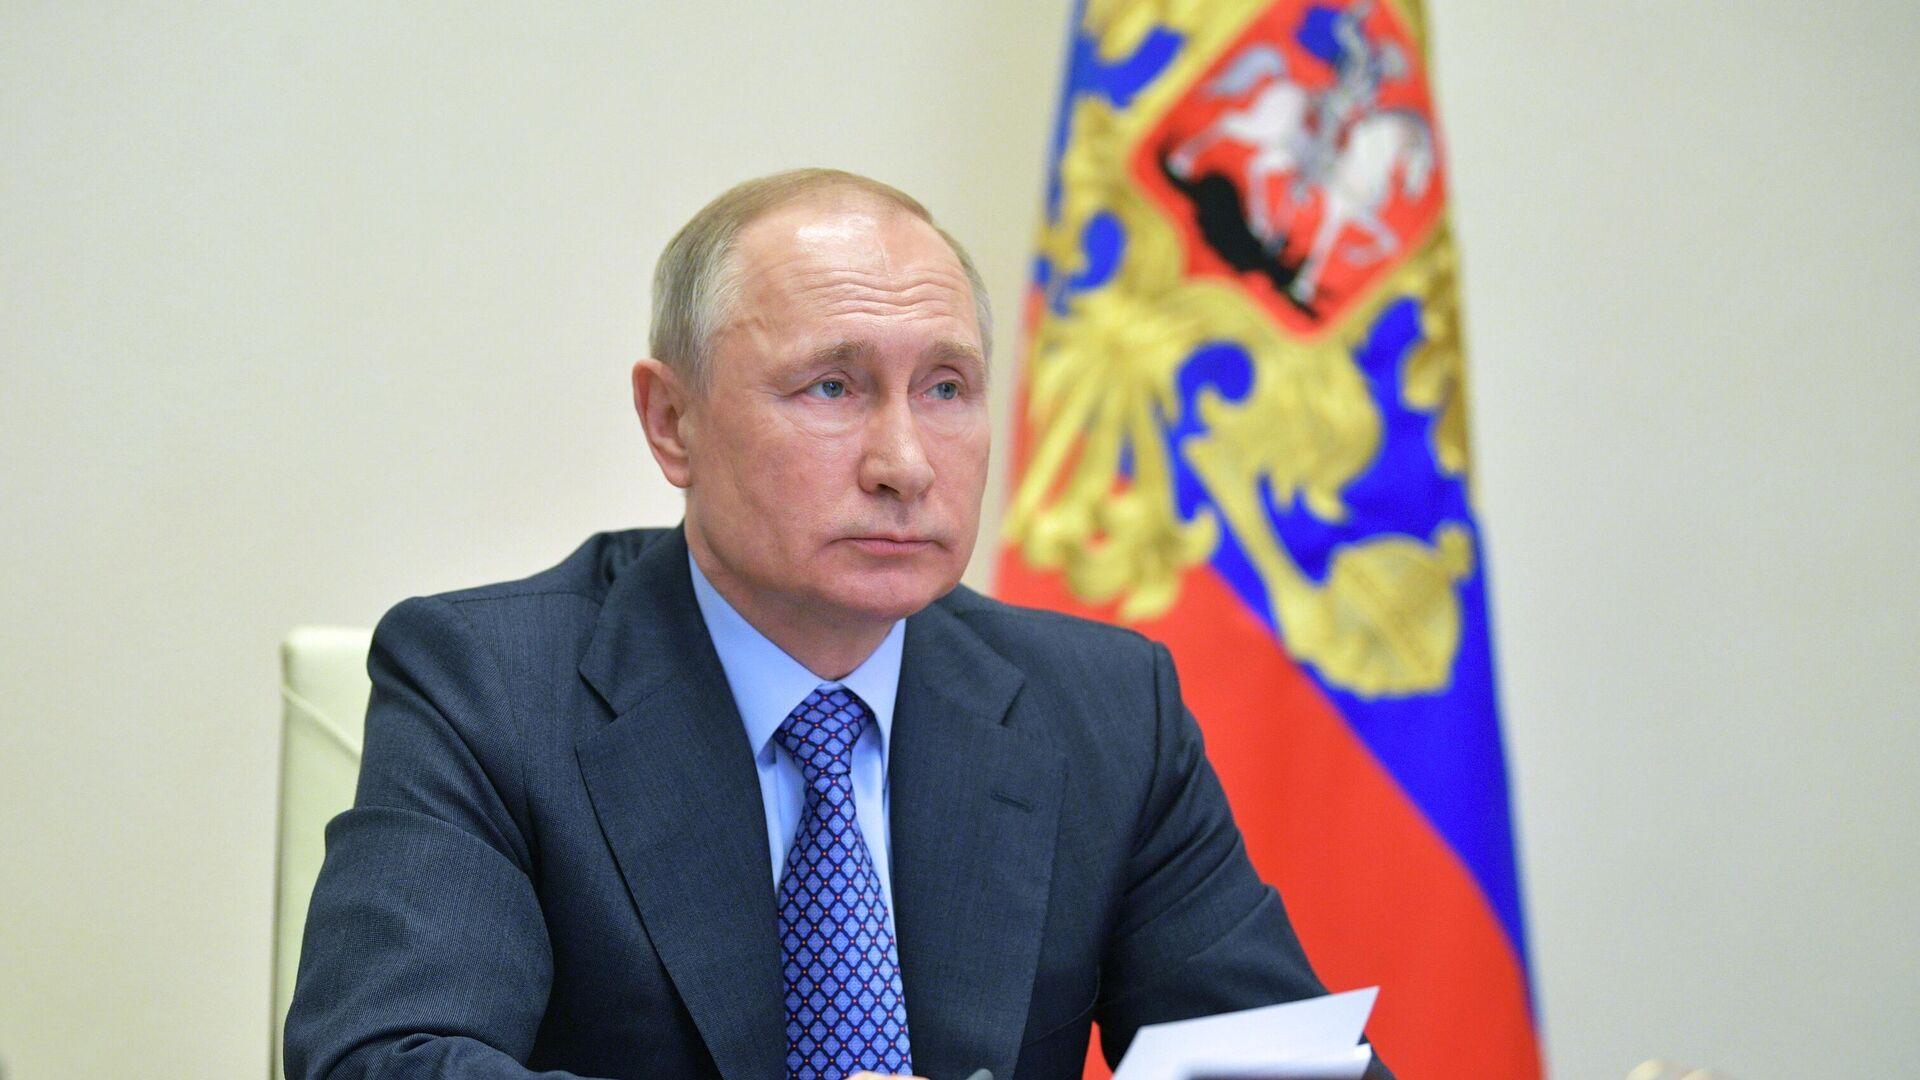 Президент РФ Владимир Путин - РИА Новости, 1920, 14.04.2020